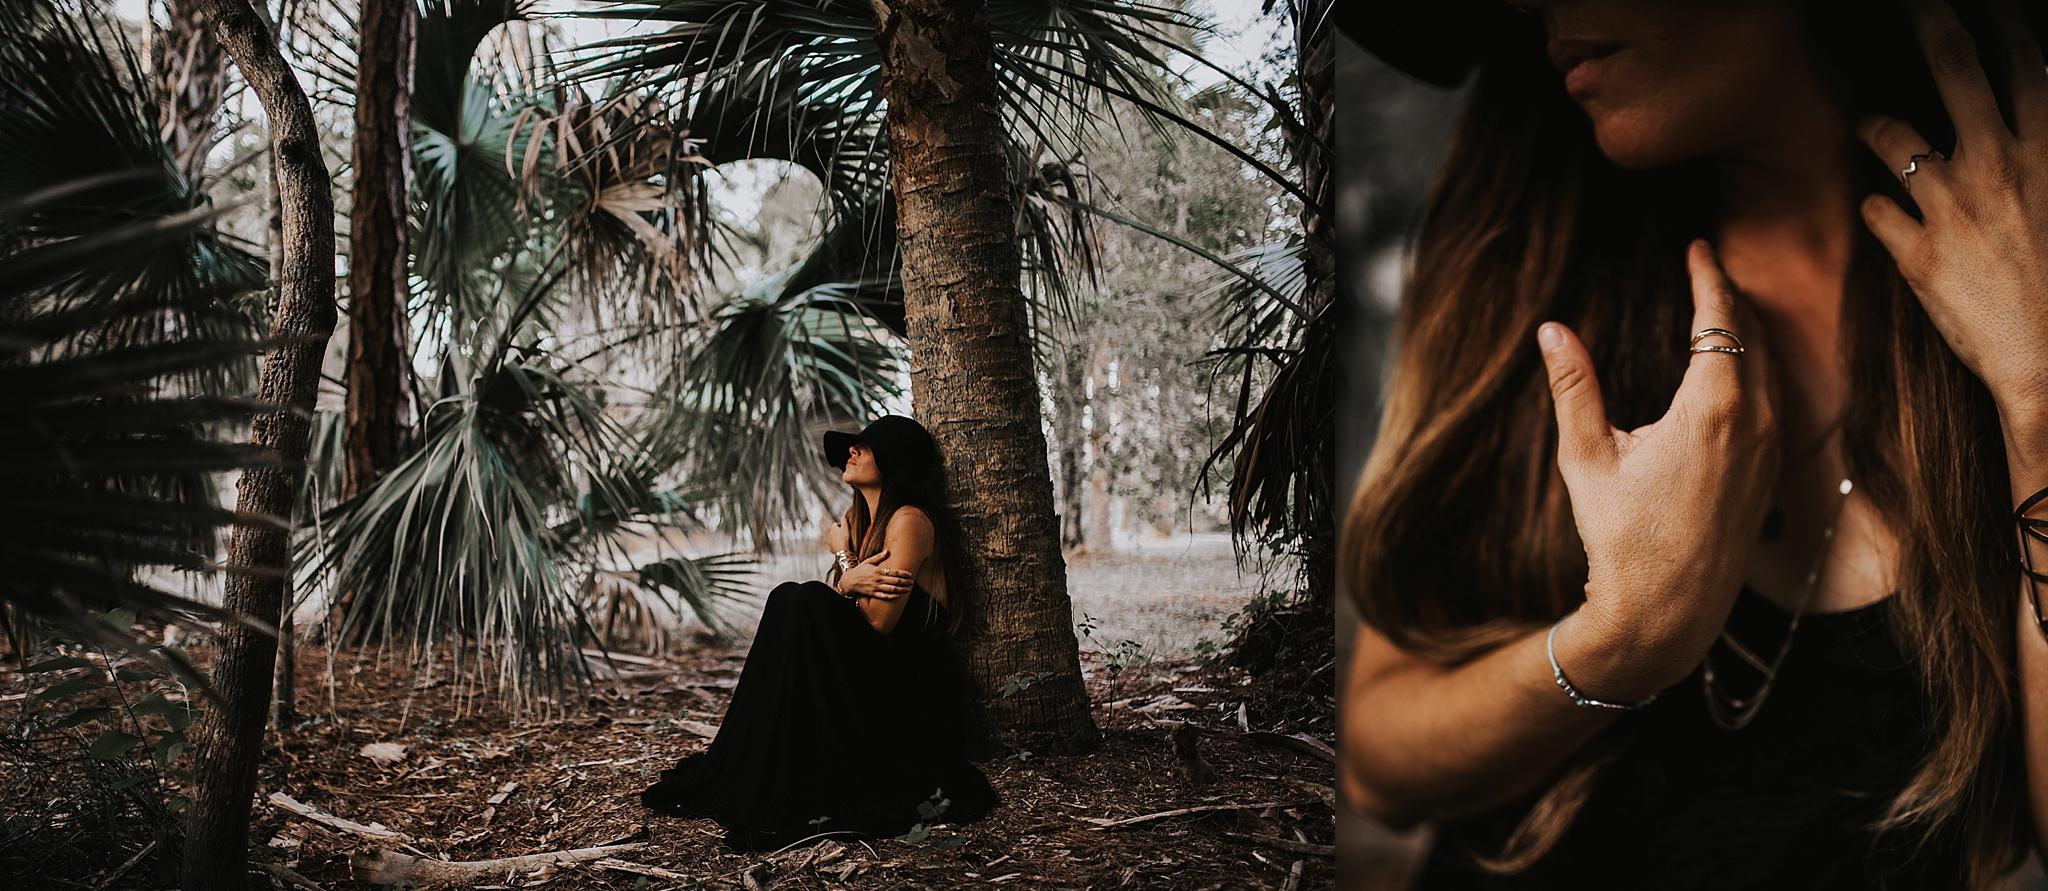 twyla jones photography - treasure coast - florida family photography riverbend park jupiter florida-6018.jpg